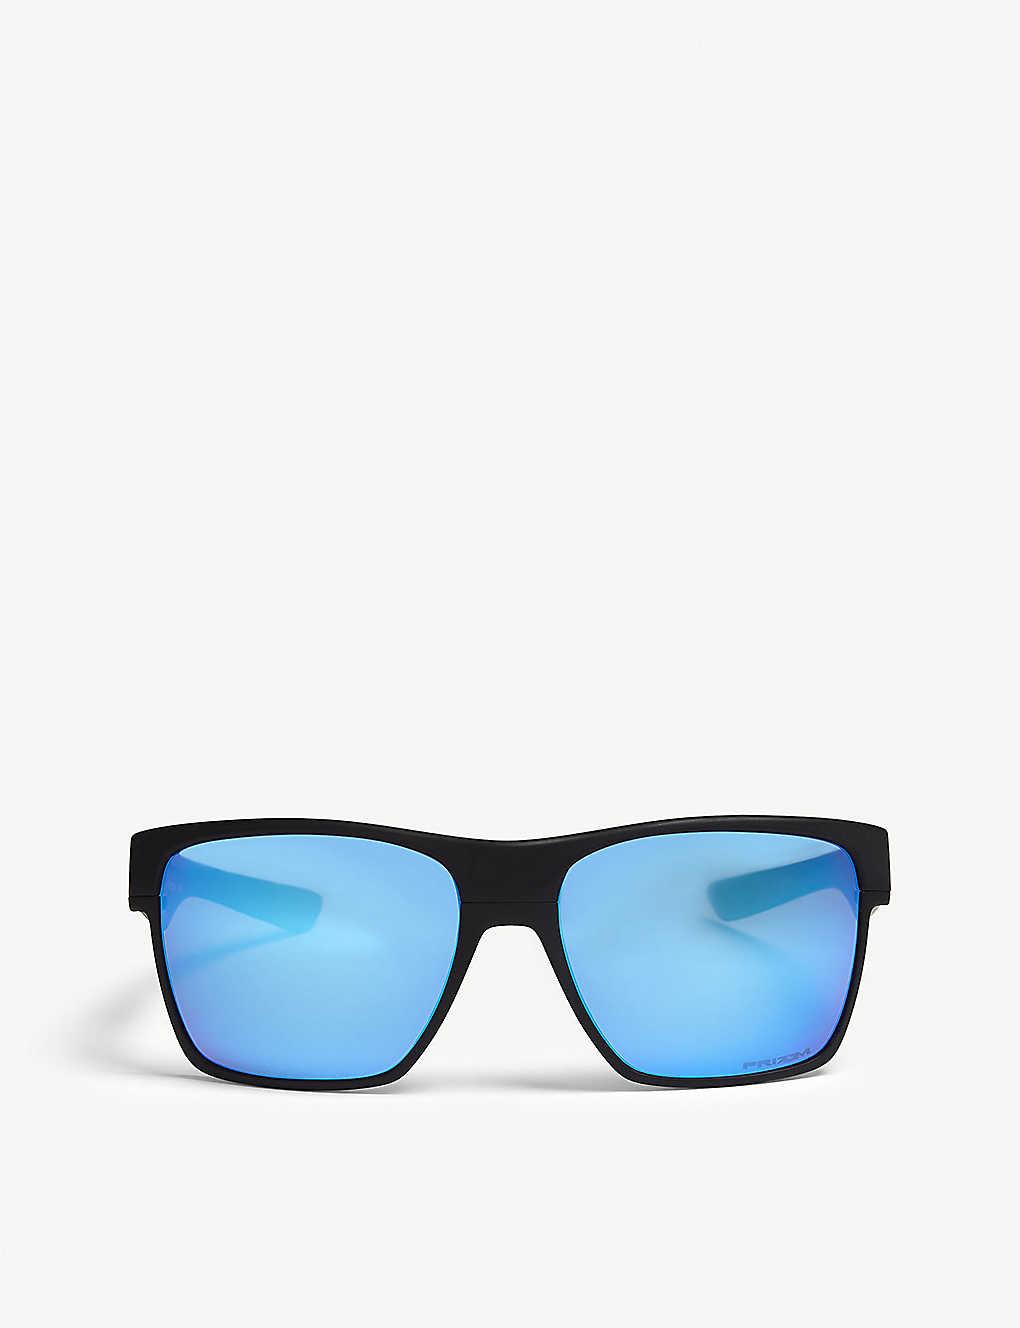 747d2c2cd3 OAKLEY - TwoFace™ XL square-frame sunglasses